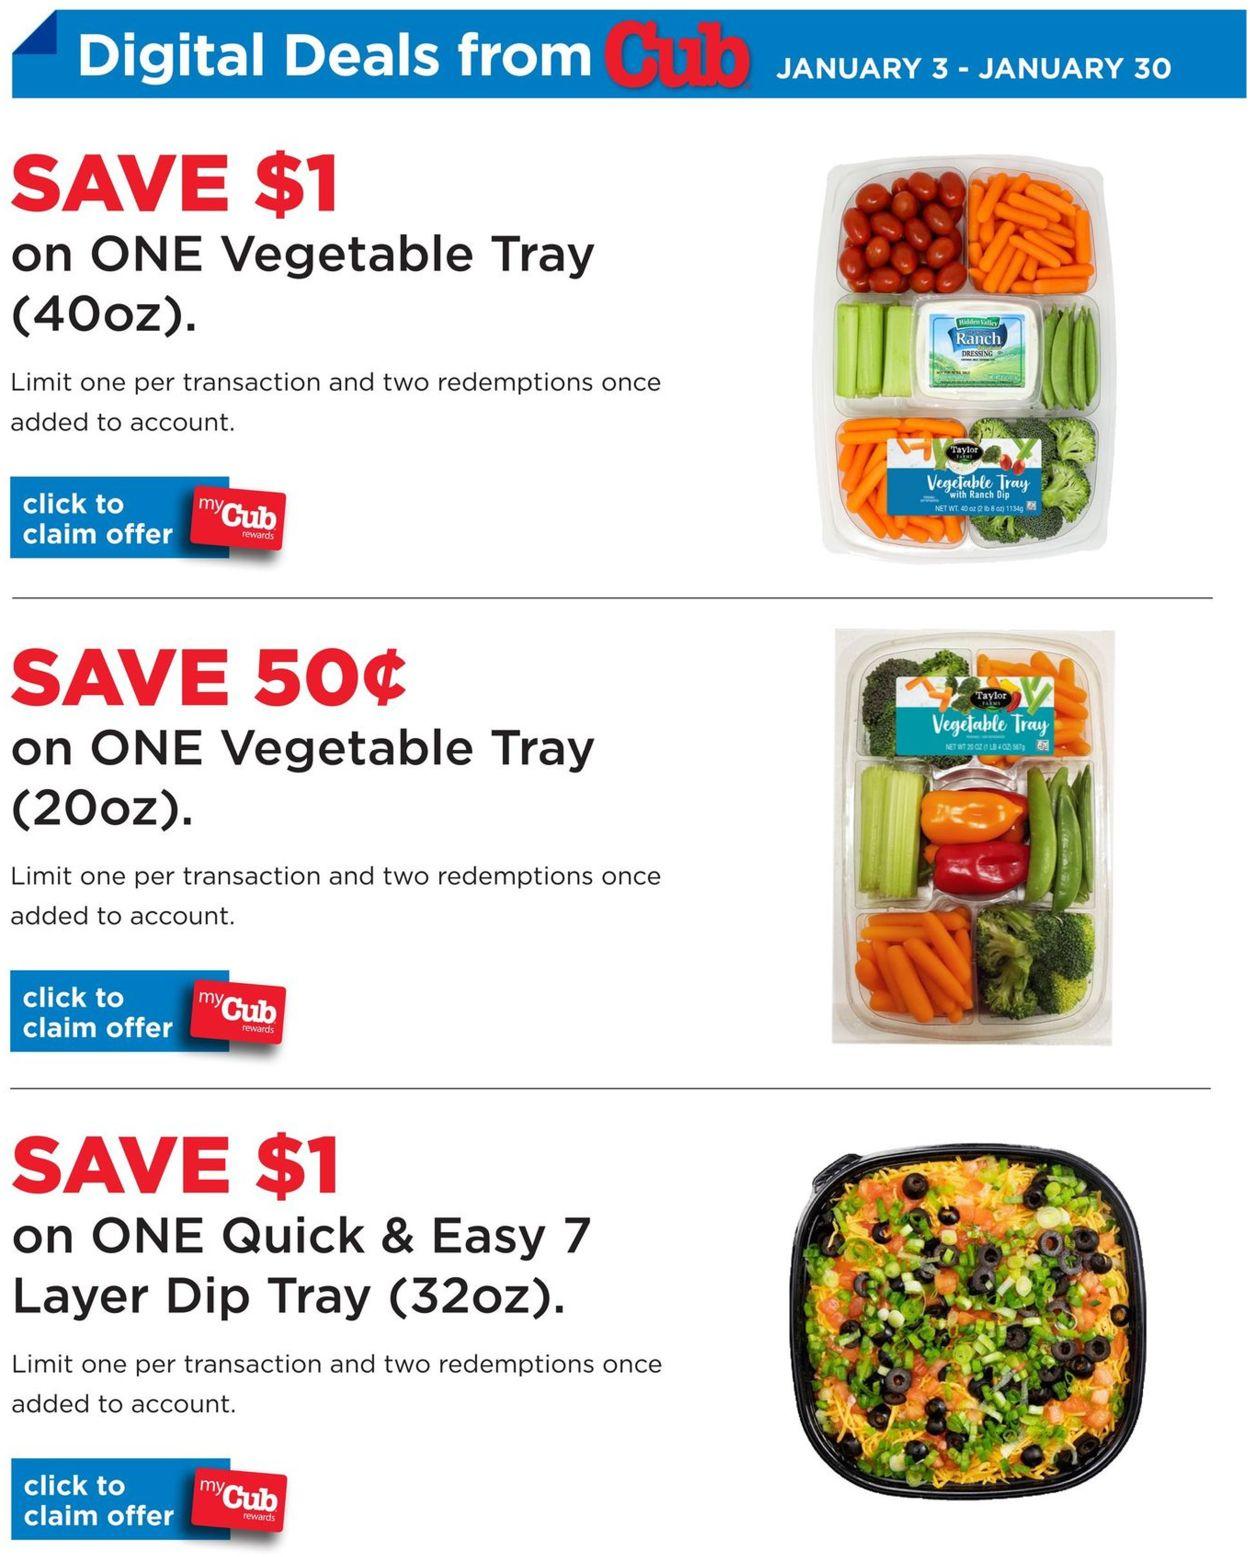 Cub Foods Digital Deals 2021 Weekly Ad Circular - valid 01/03-01/30/2021